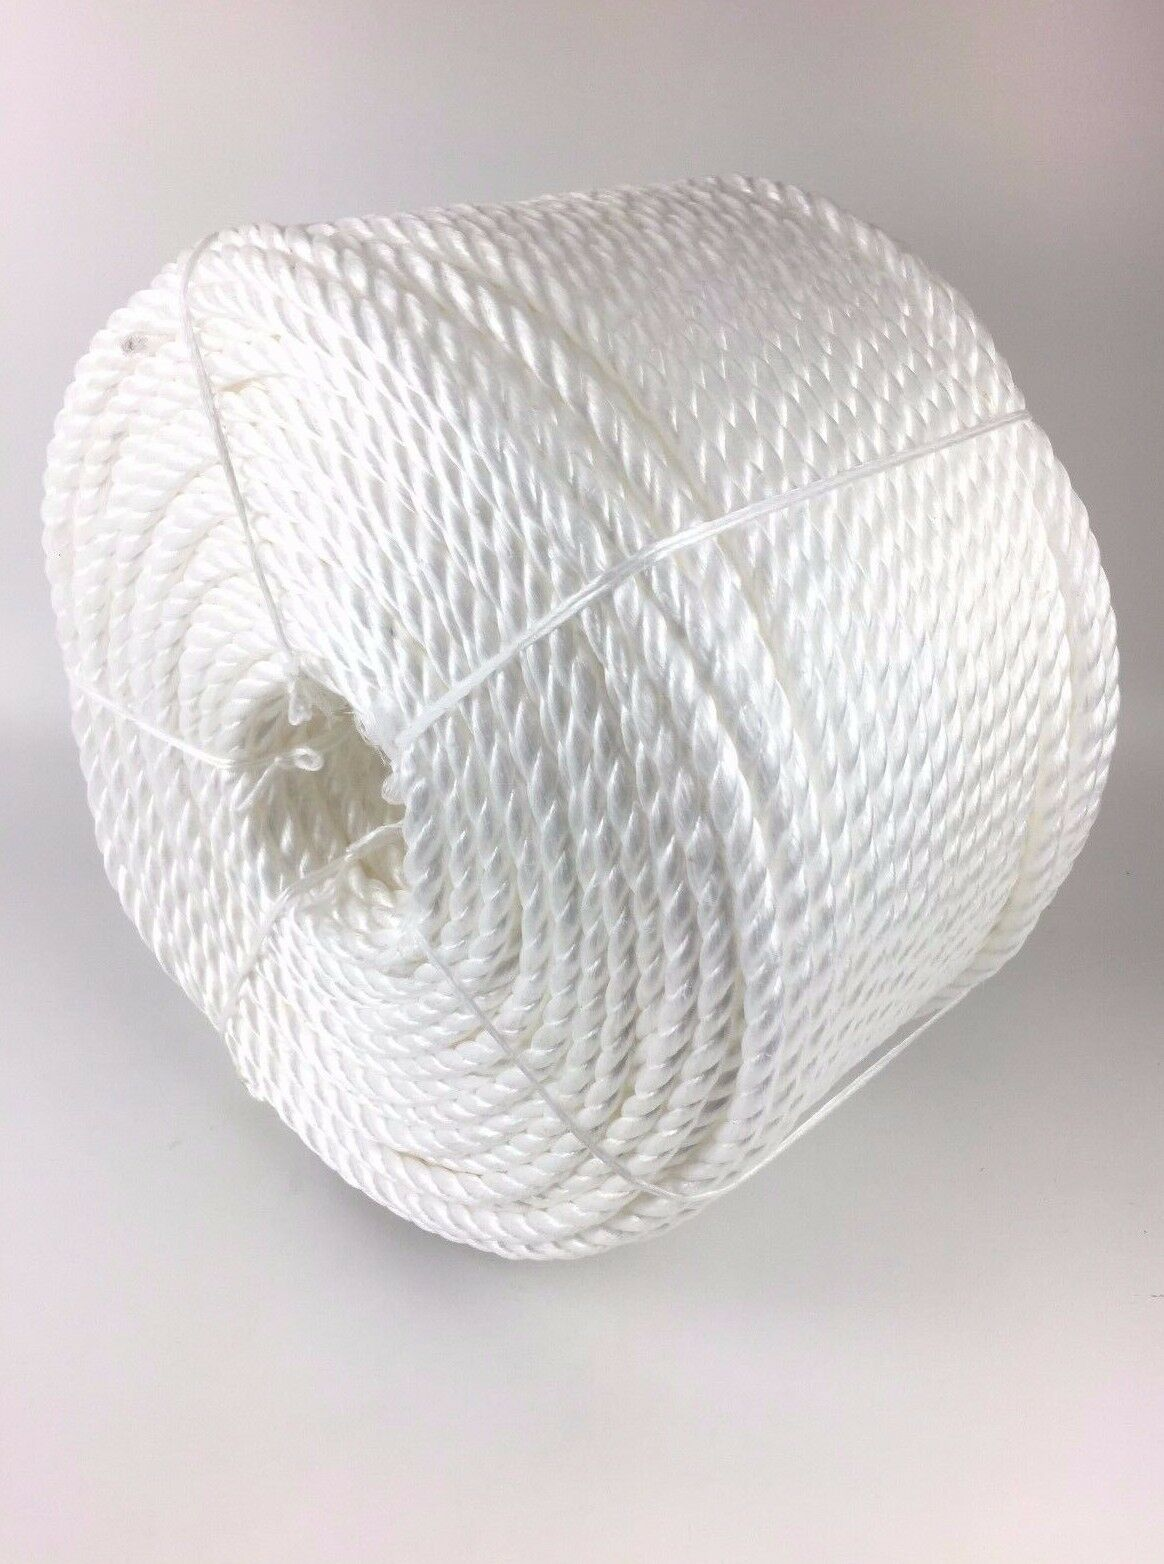 16mm blancoo polipropileno cuerda x 220m BOBINA, espirales,